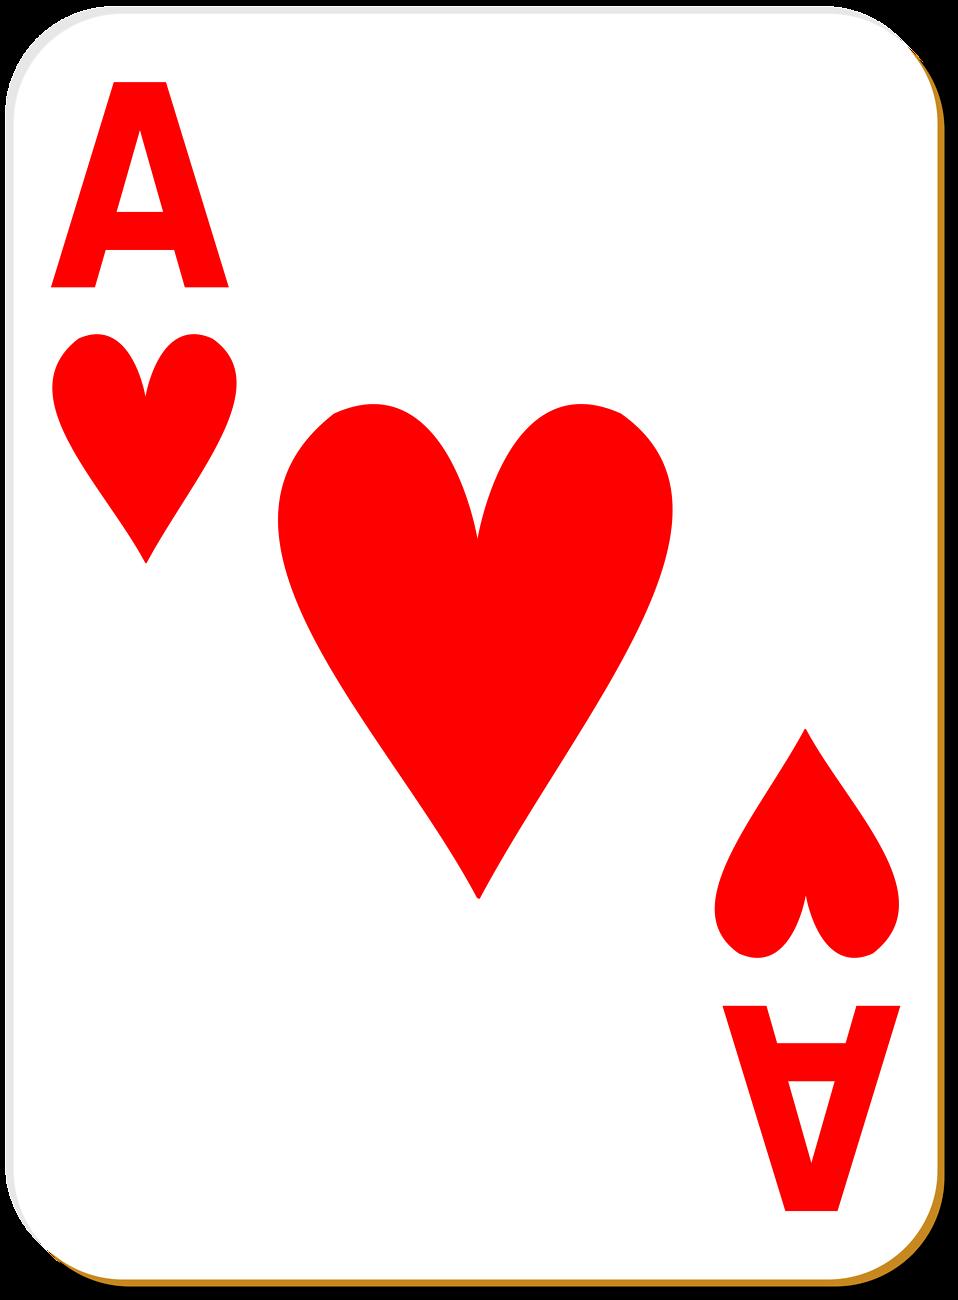 Ace card clipart jpg library Ace Of Clubs Playing Card Clipart - Clipart Kid jpg library